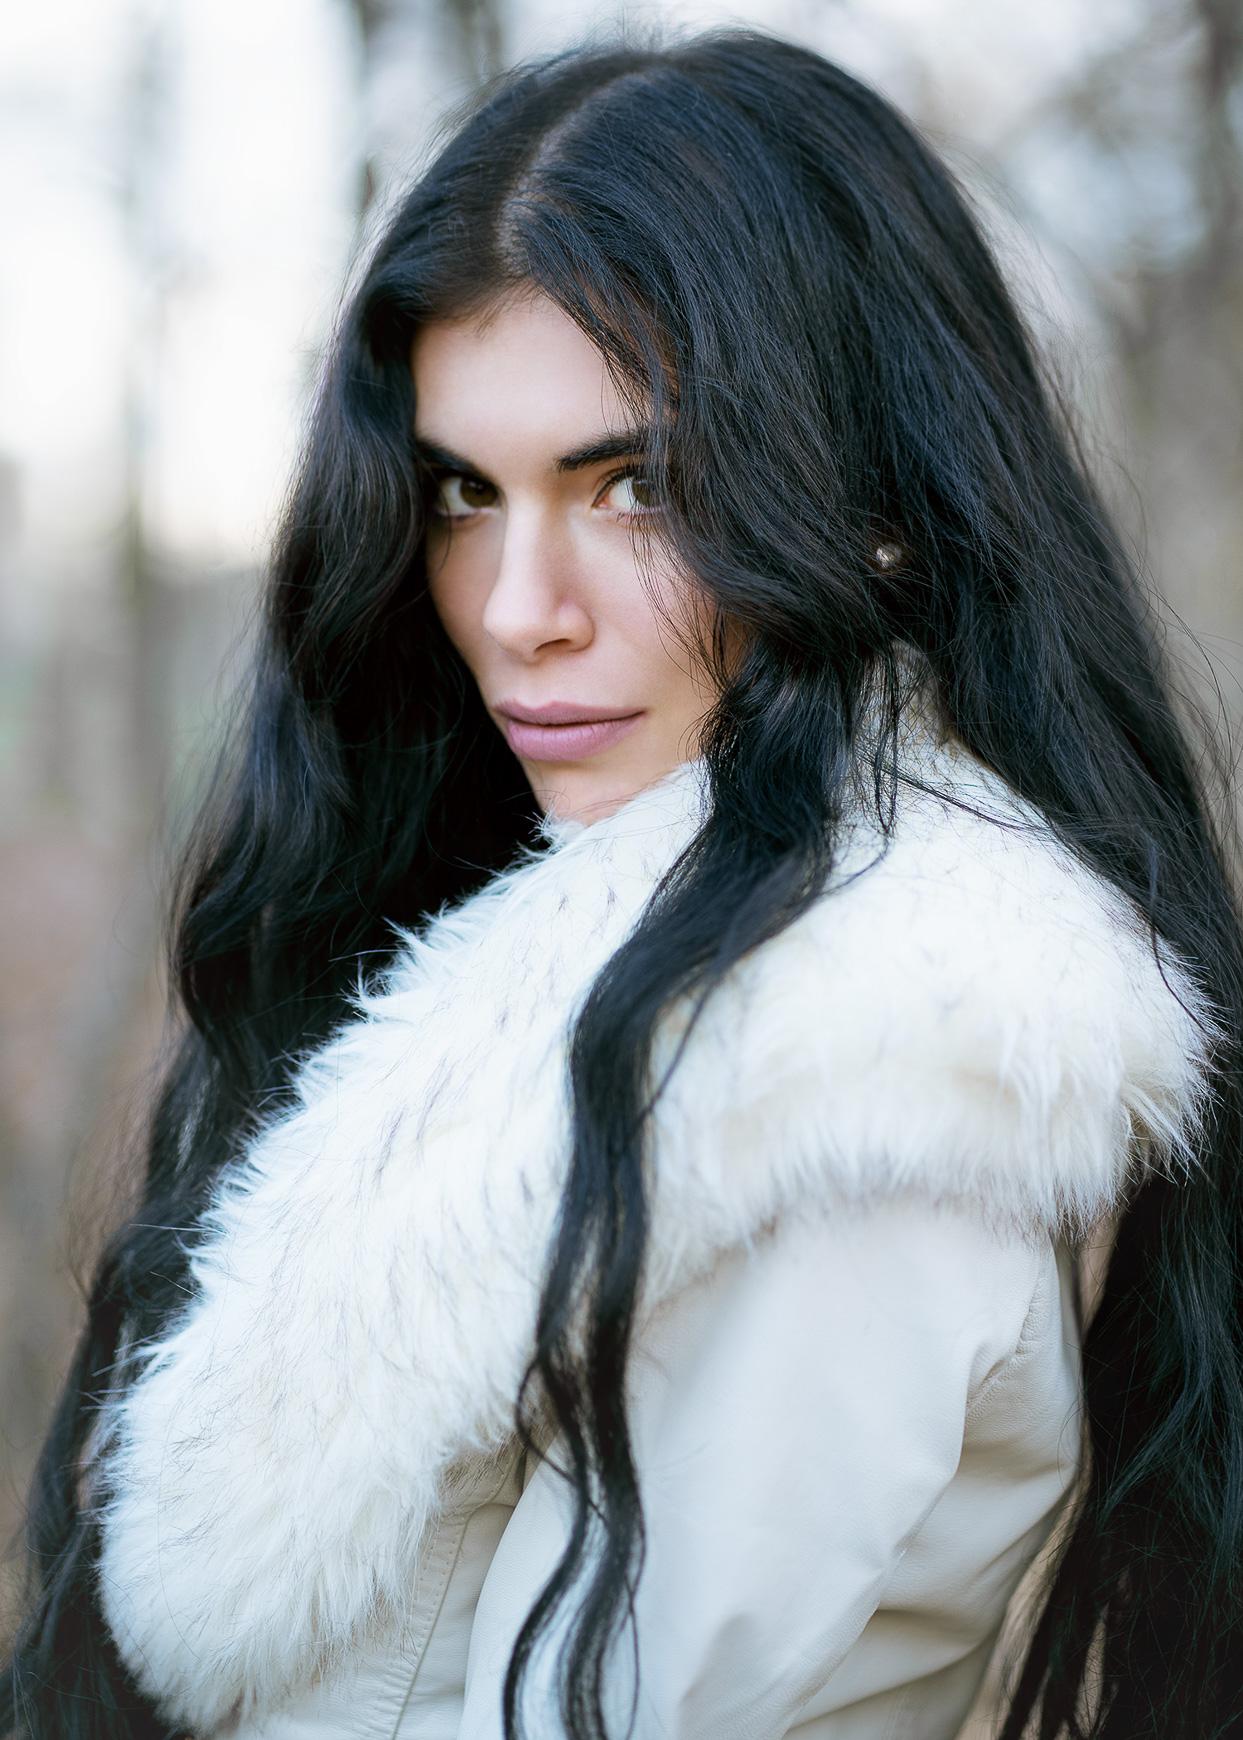 Portraits Vito Photography Dormagen Web 10